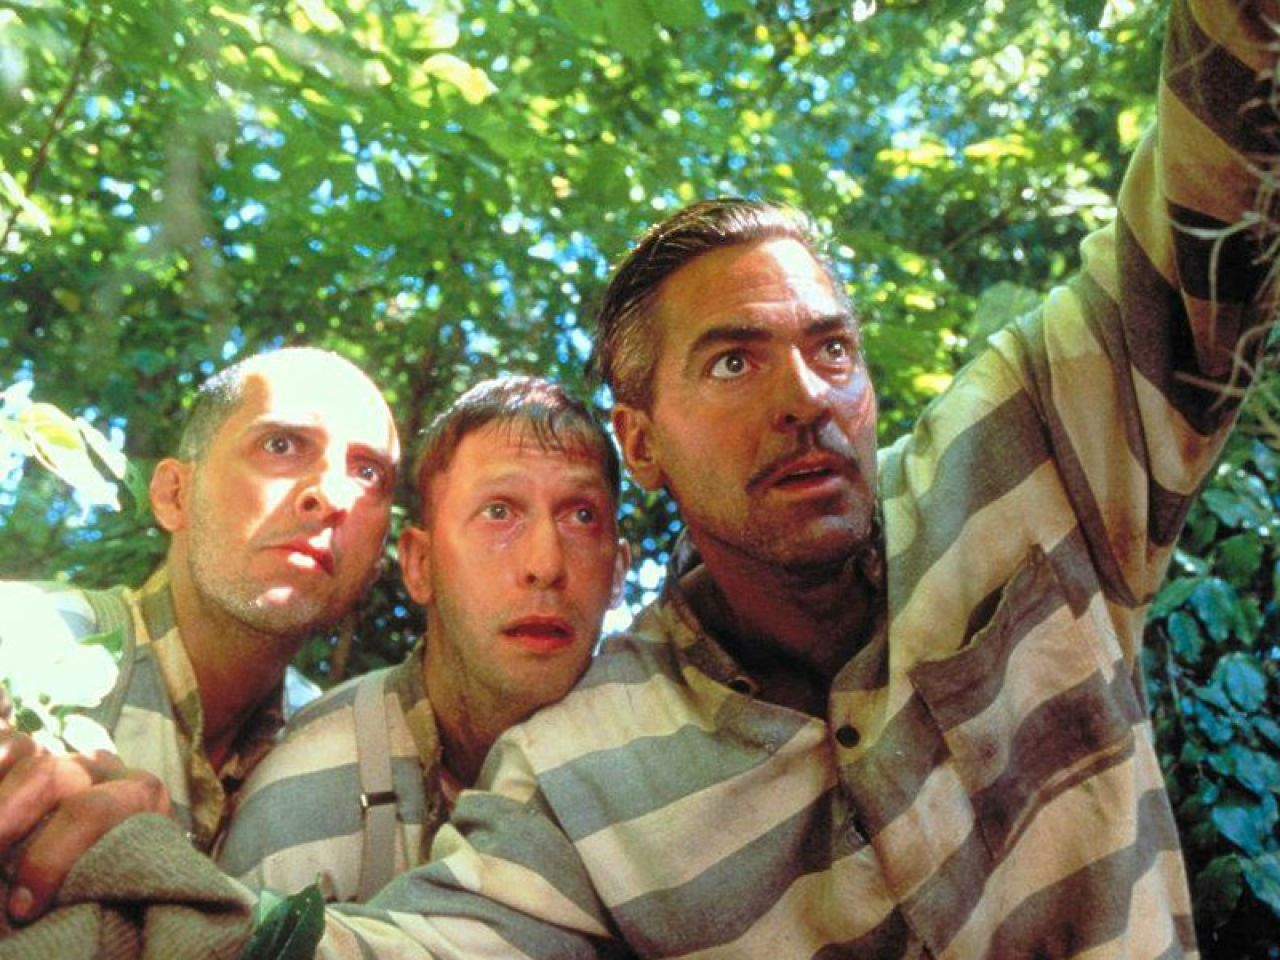 PeteBACK: Film•Peteback: O Brother, where art thou?